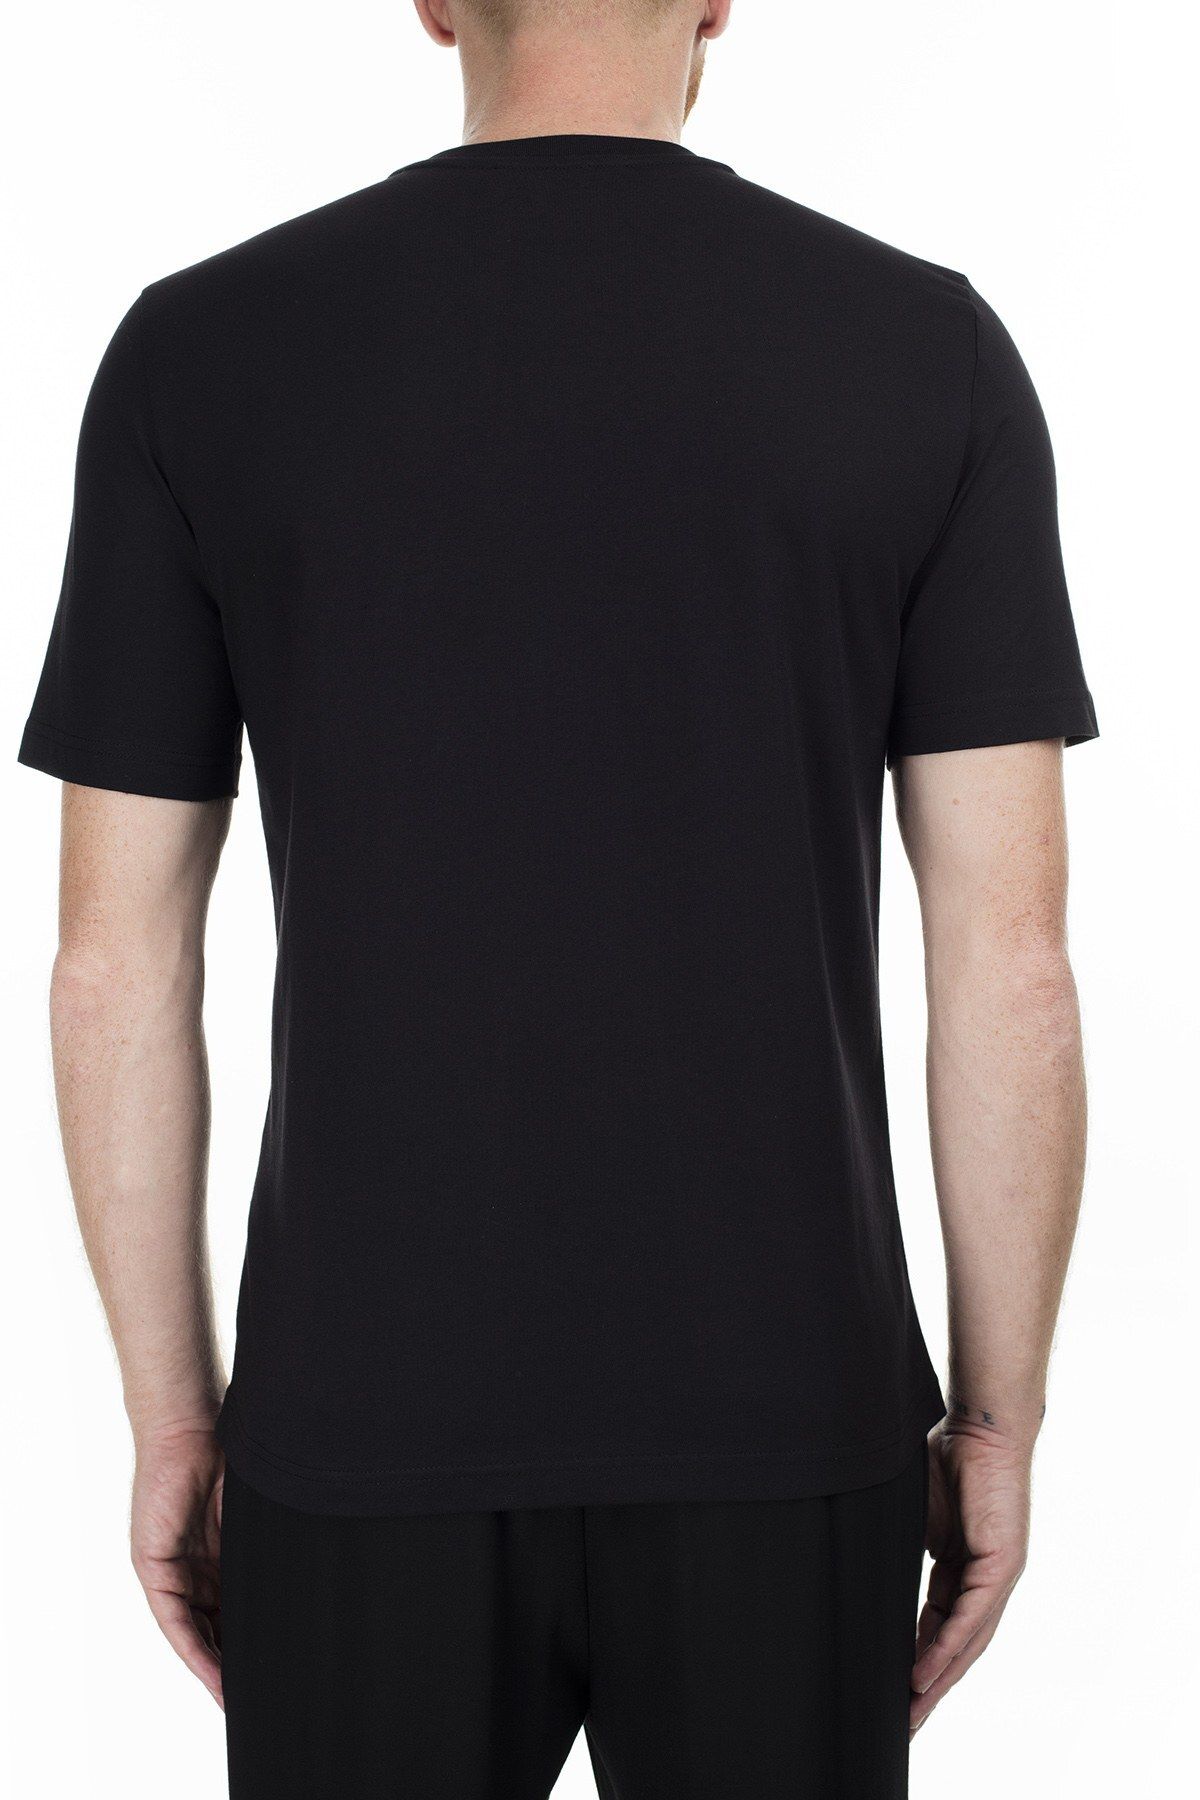 Love Moschino Erkek T Shirt S M47323JM3876 C74 SİYAH